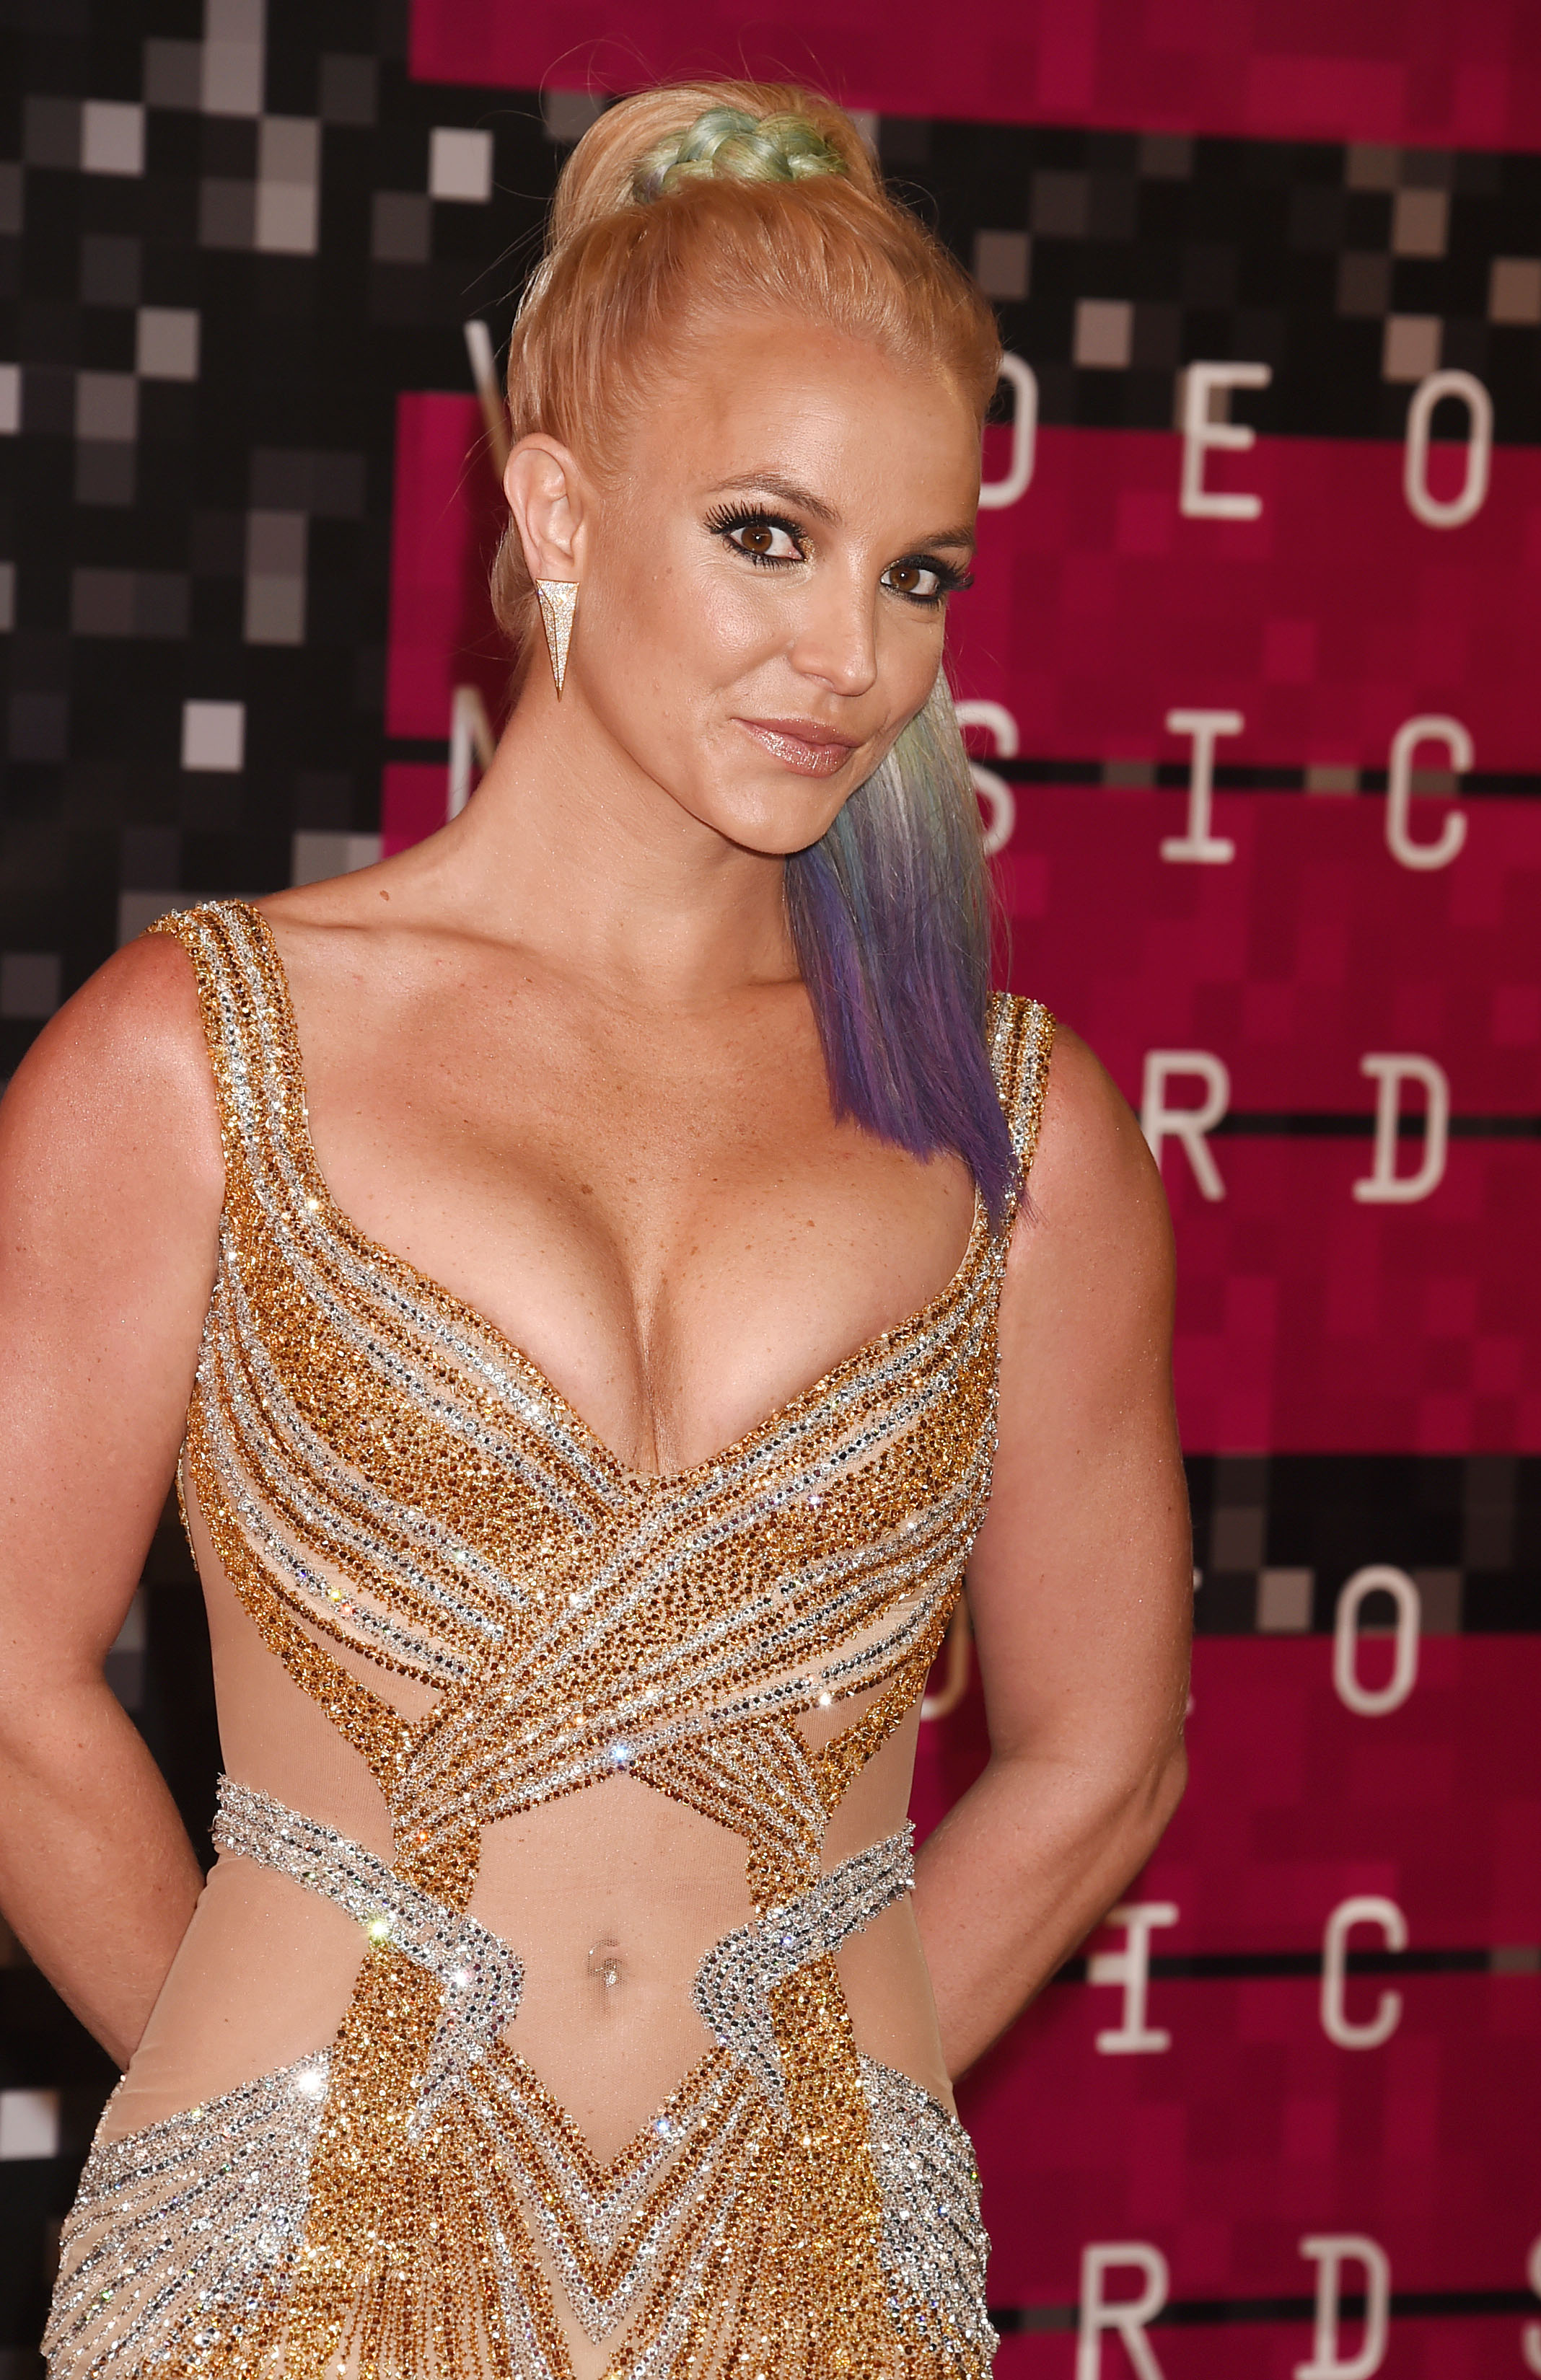 Britney Spears Teaches Dance Class at Rockit Dance Studio